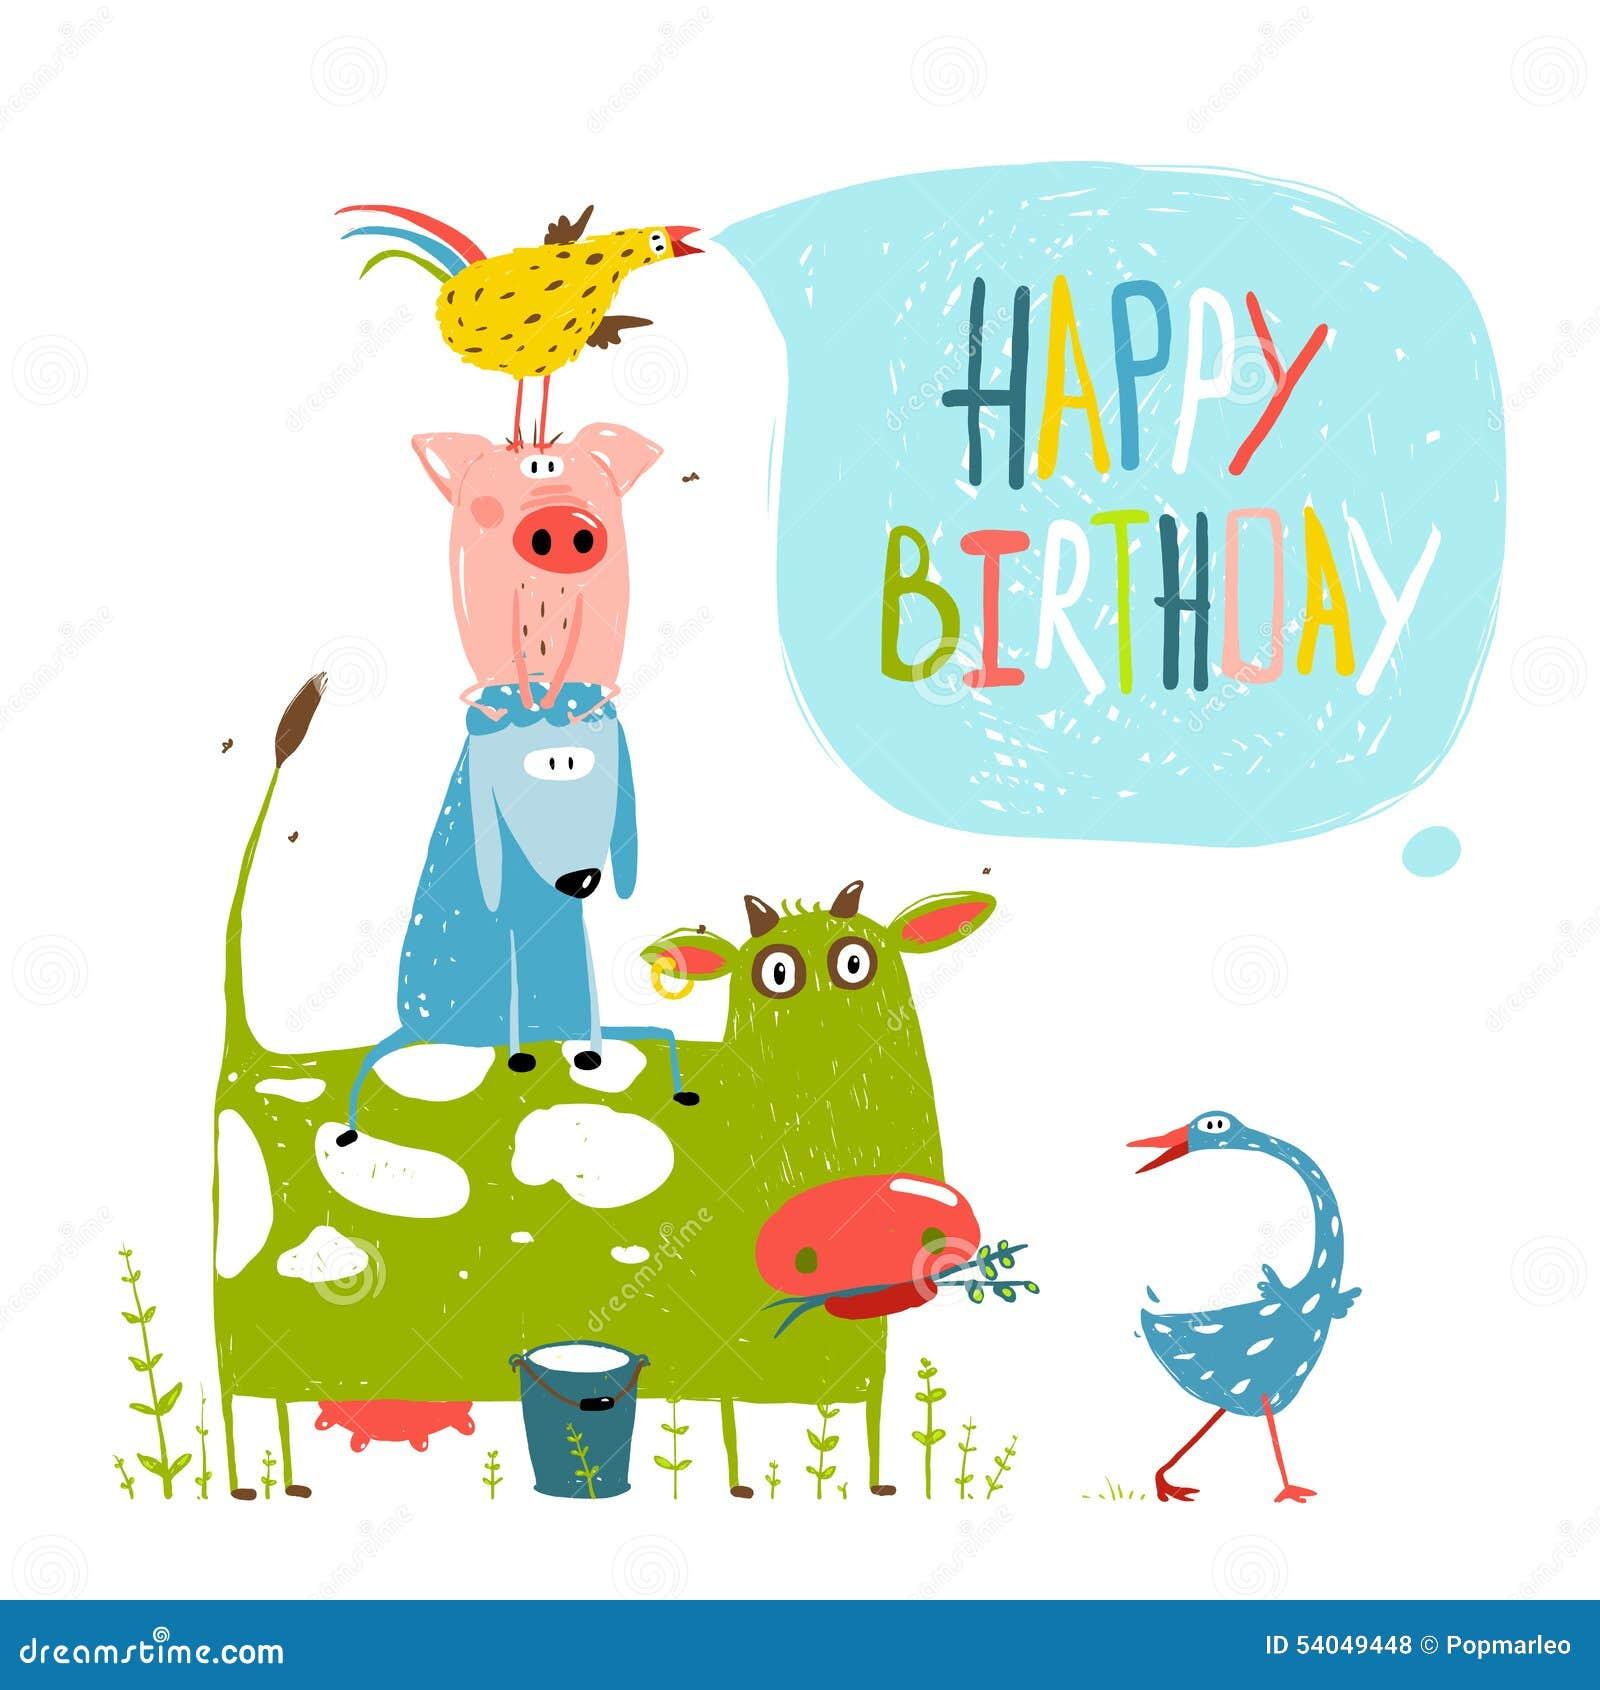 Happy birthday card with farm animals stock vector illustration of birthday fun cartoon farm animals pyramid greeting royalty free stock photos kristyandbryce Image collections